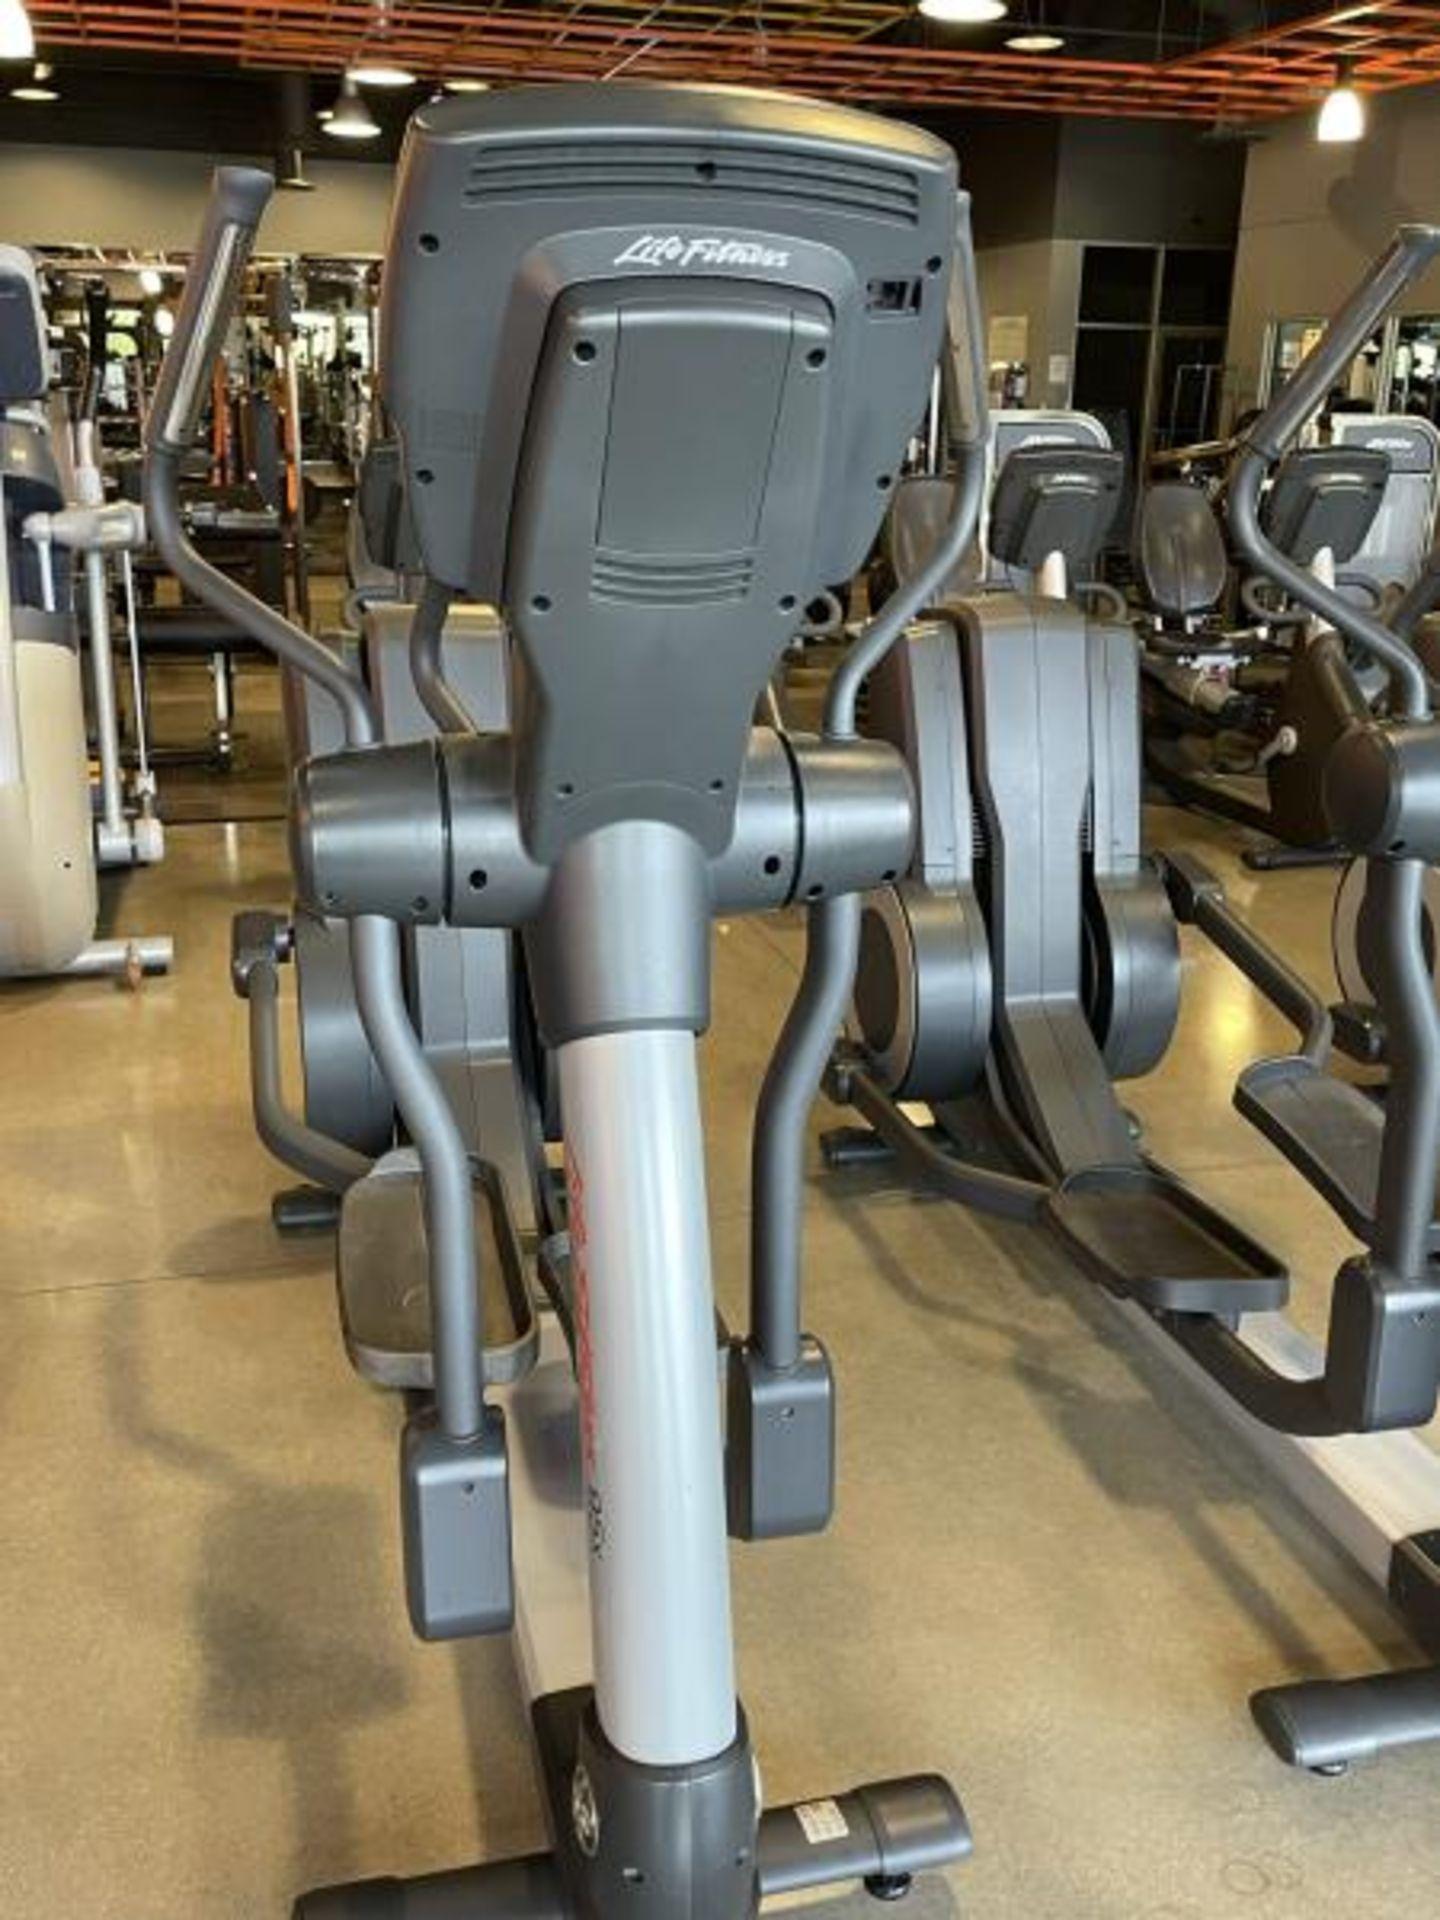 Life Fitness Elliptical M: 95X - Image 3 of 6